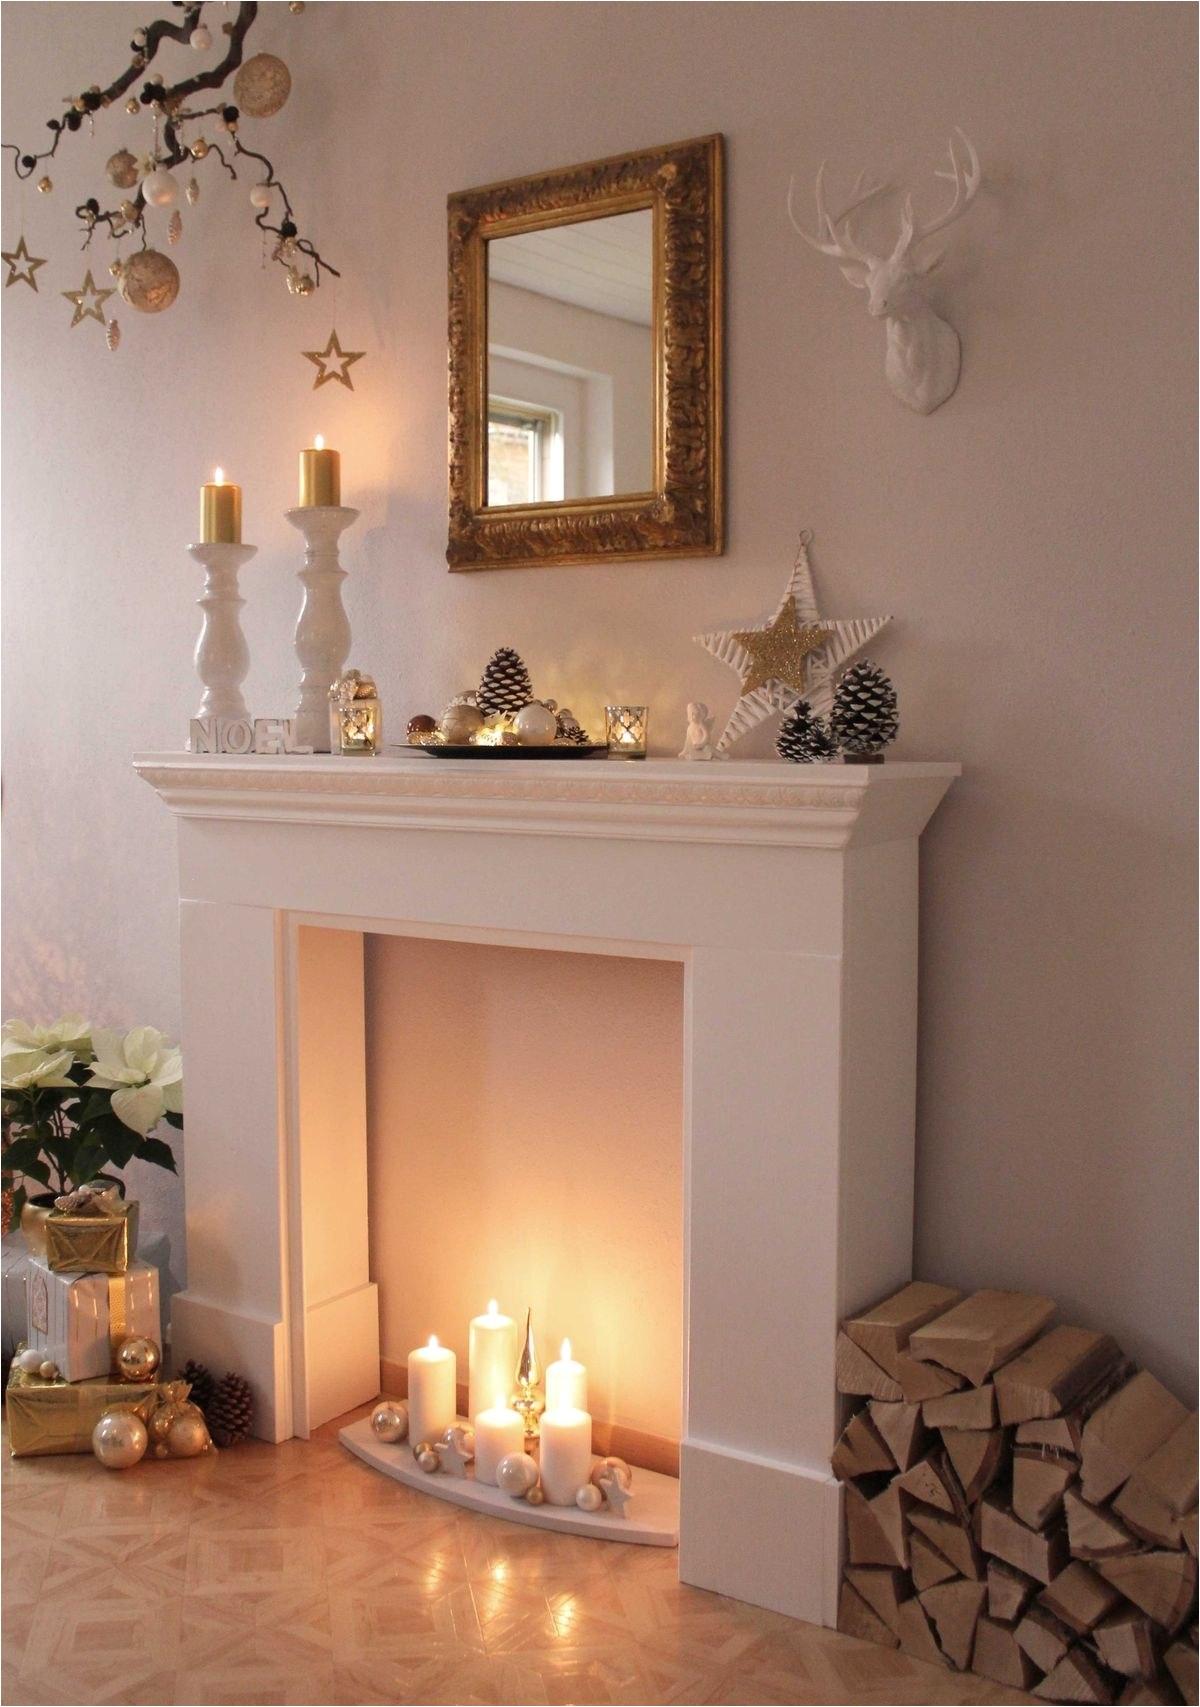 Fireplace and Mantel Luxury White Mantel Gas Fireplace